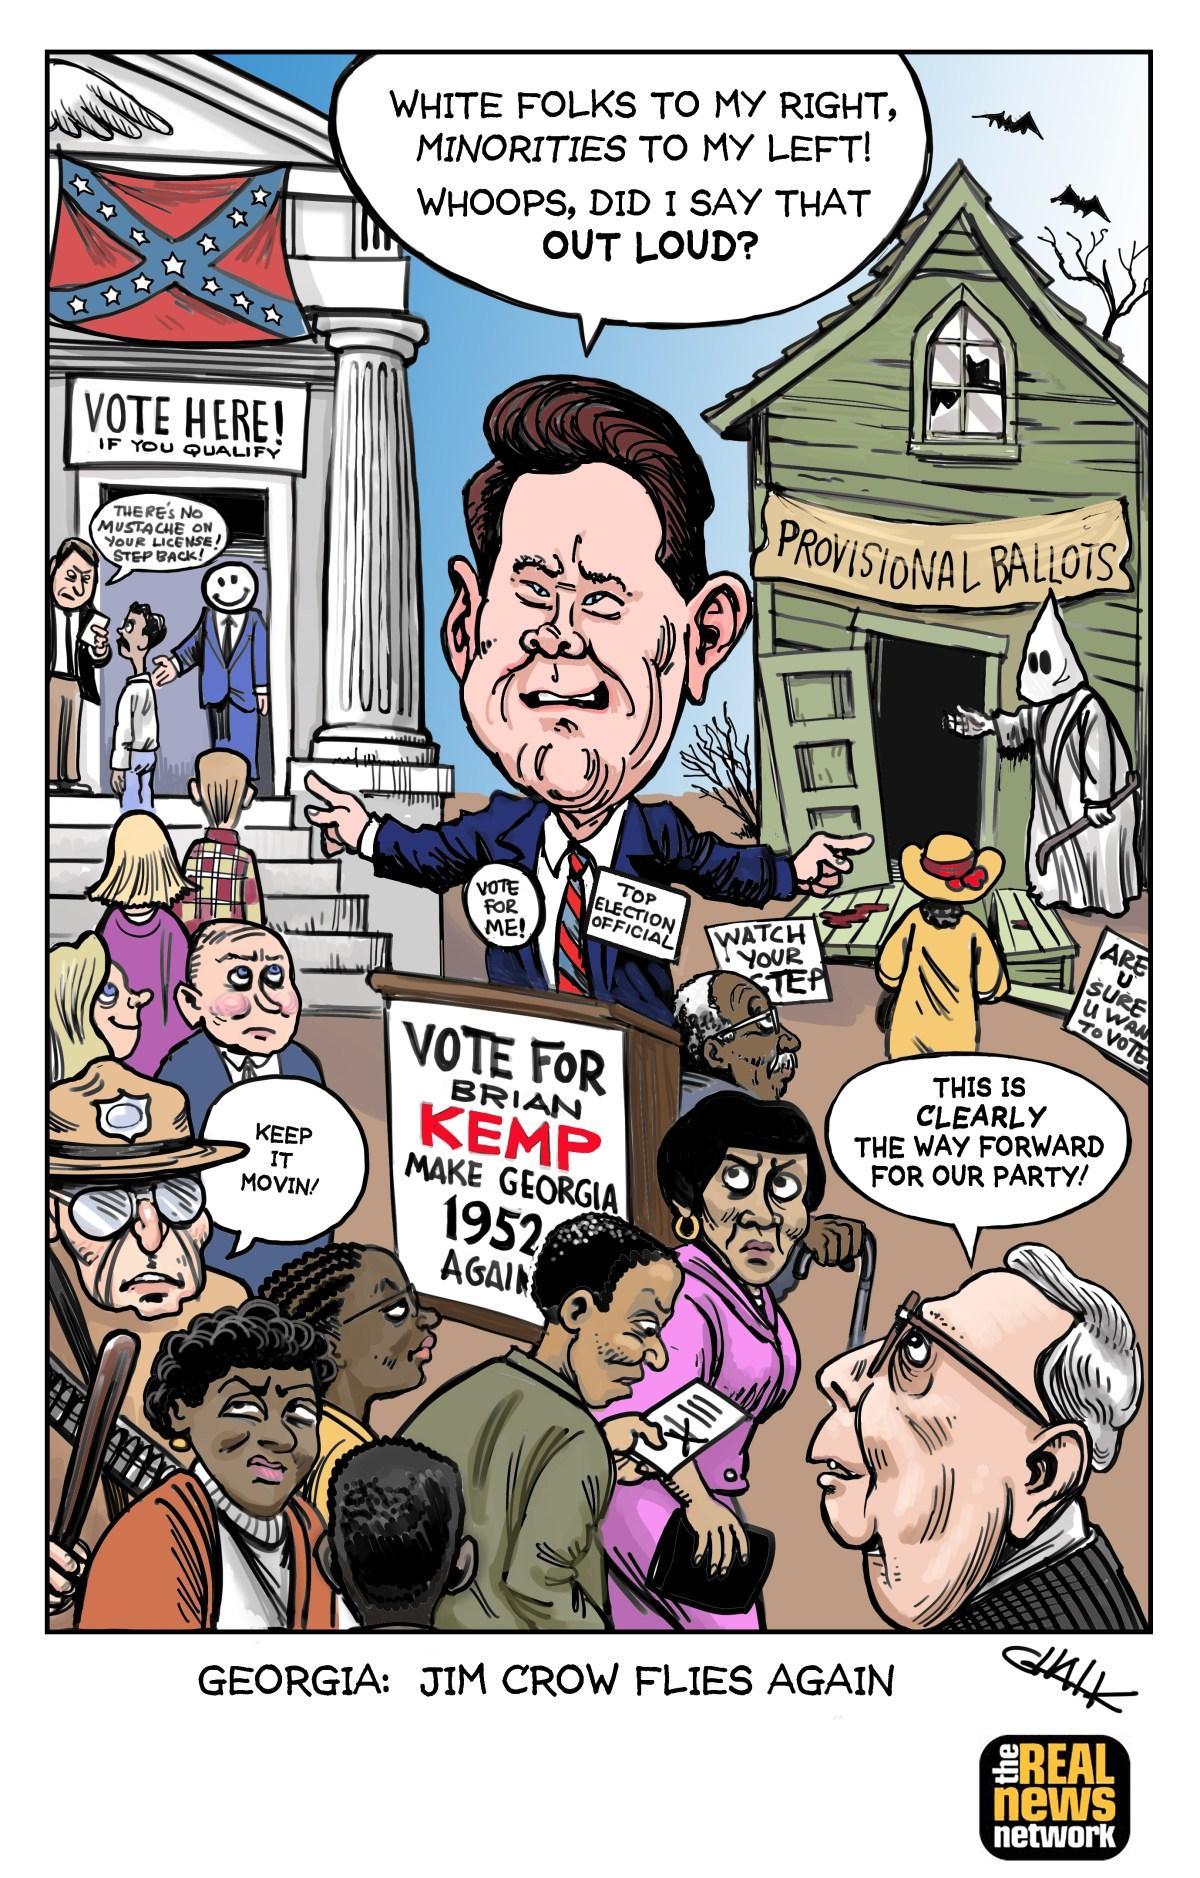 Jim Crow Rides Again: A Cartoon by Tom Chalkley